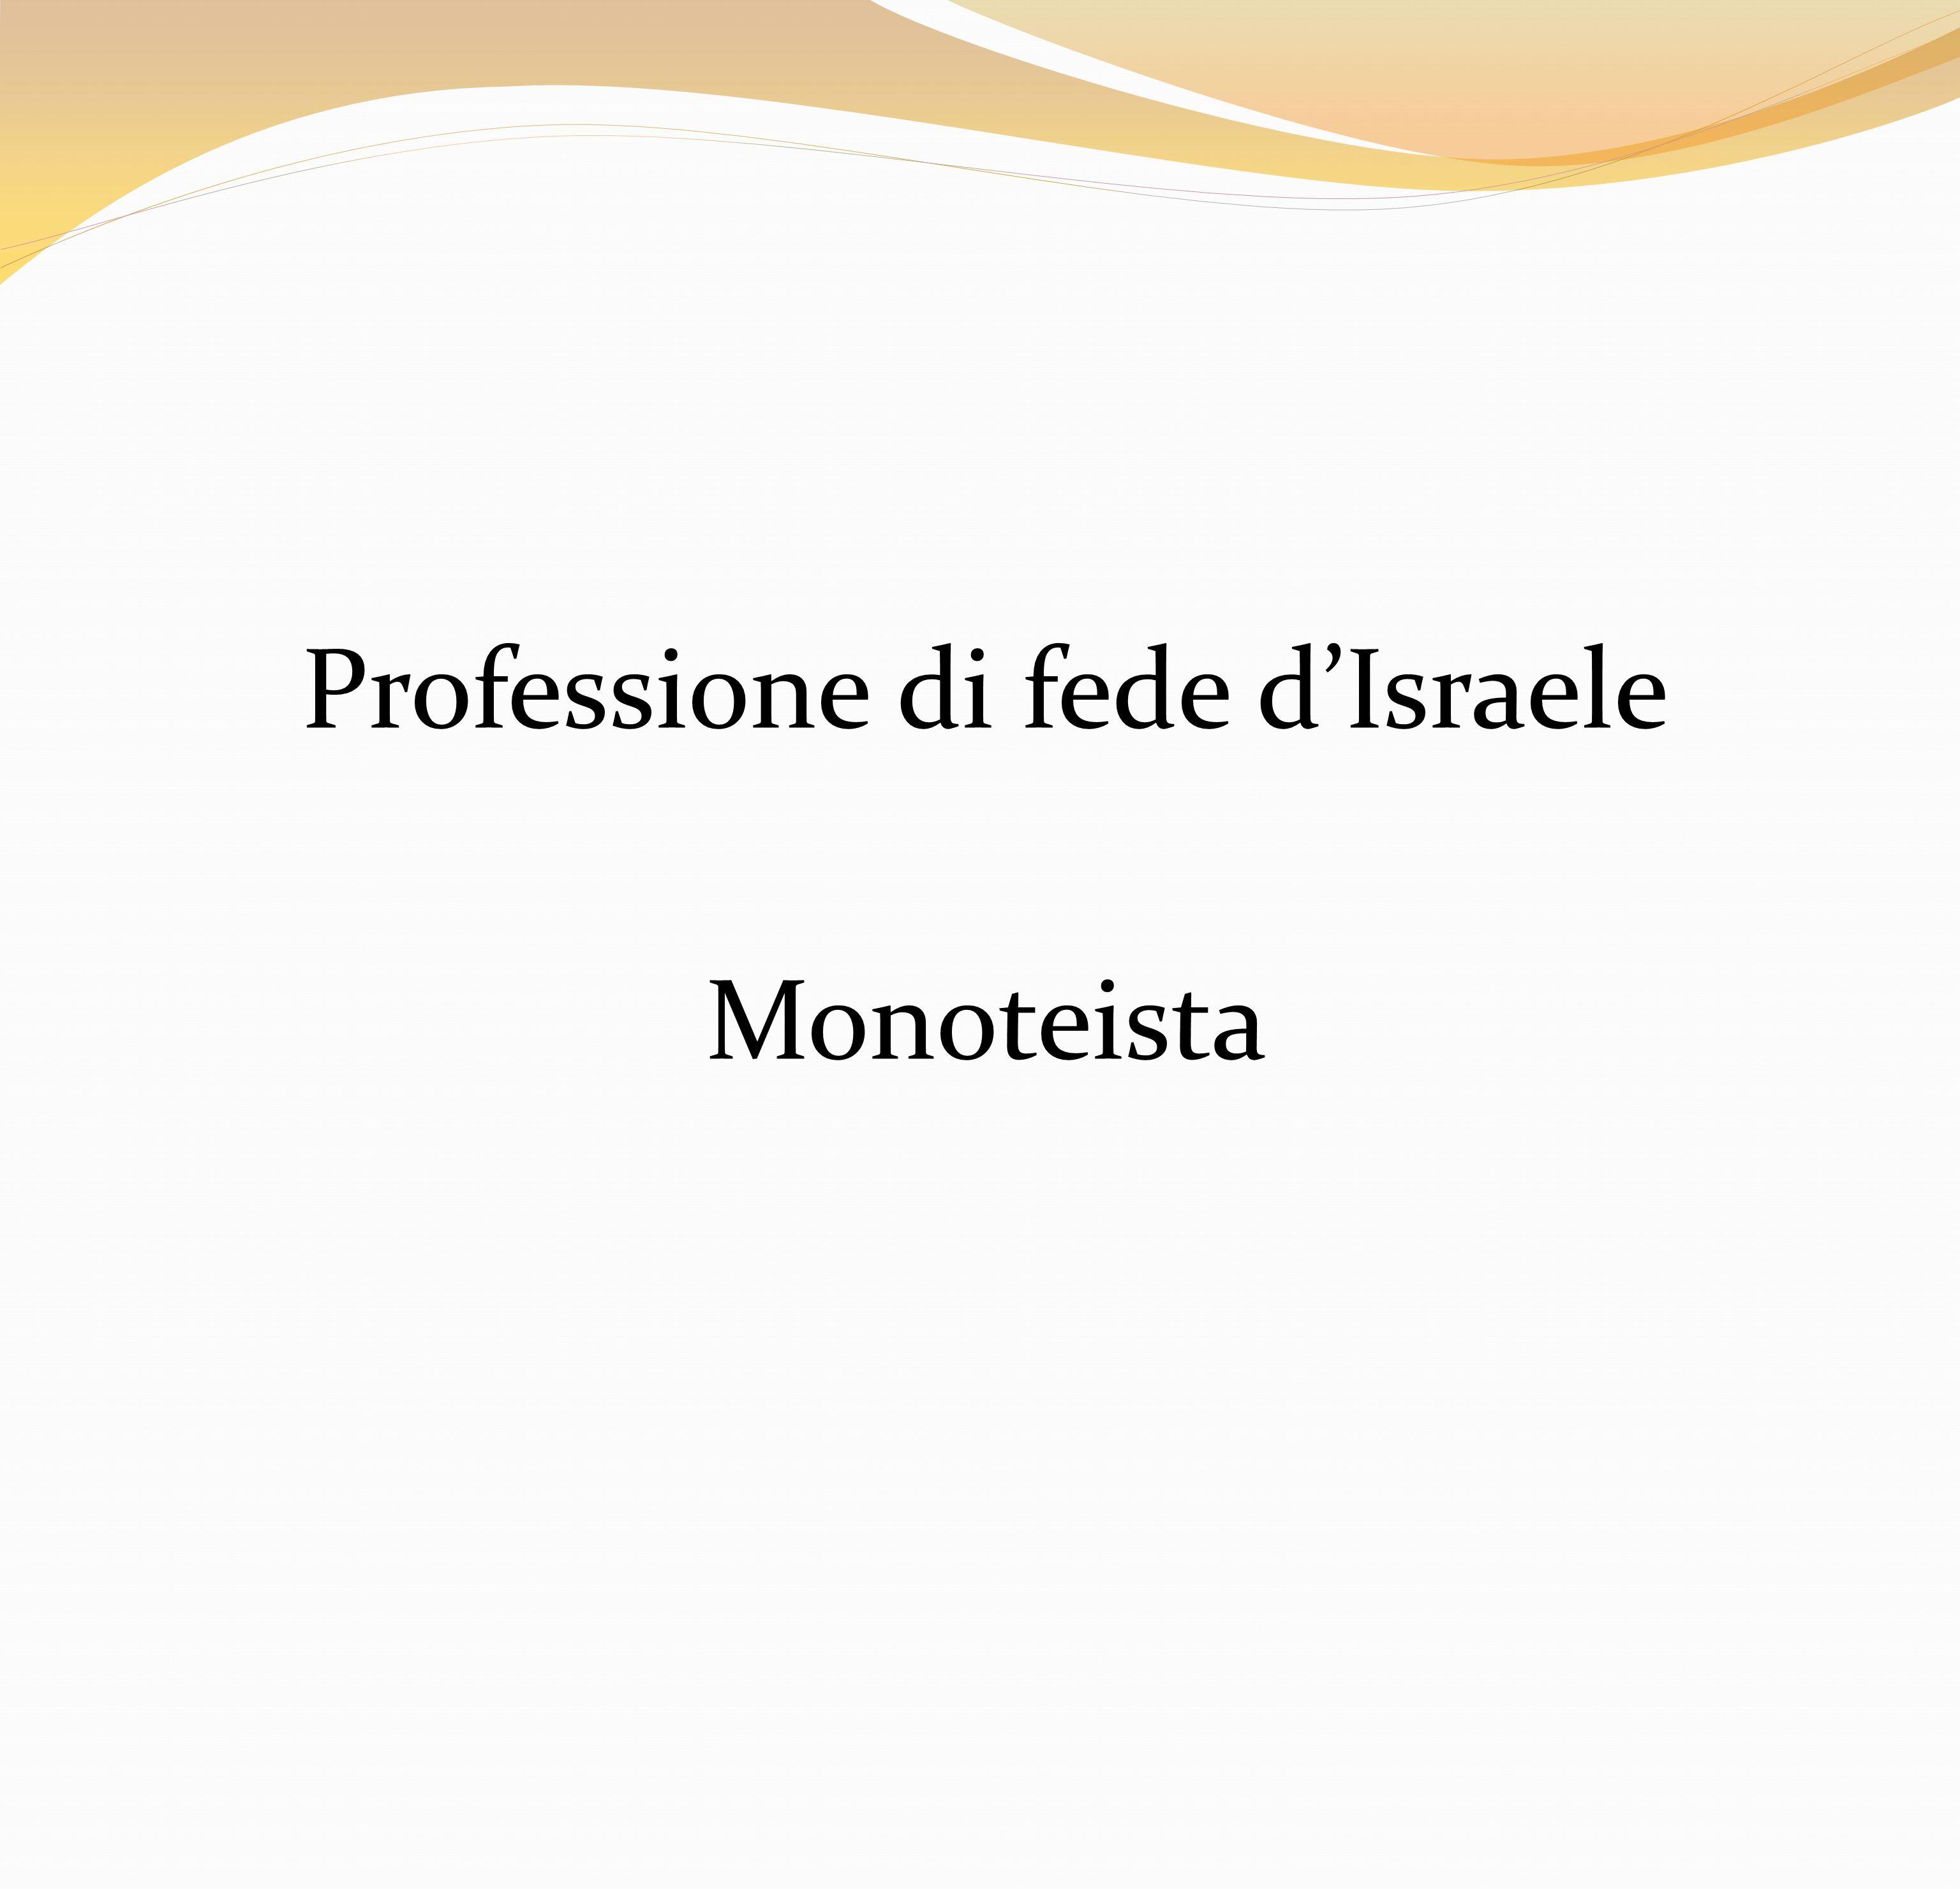 Professione di fede dIsraele Monoteista